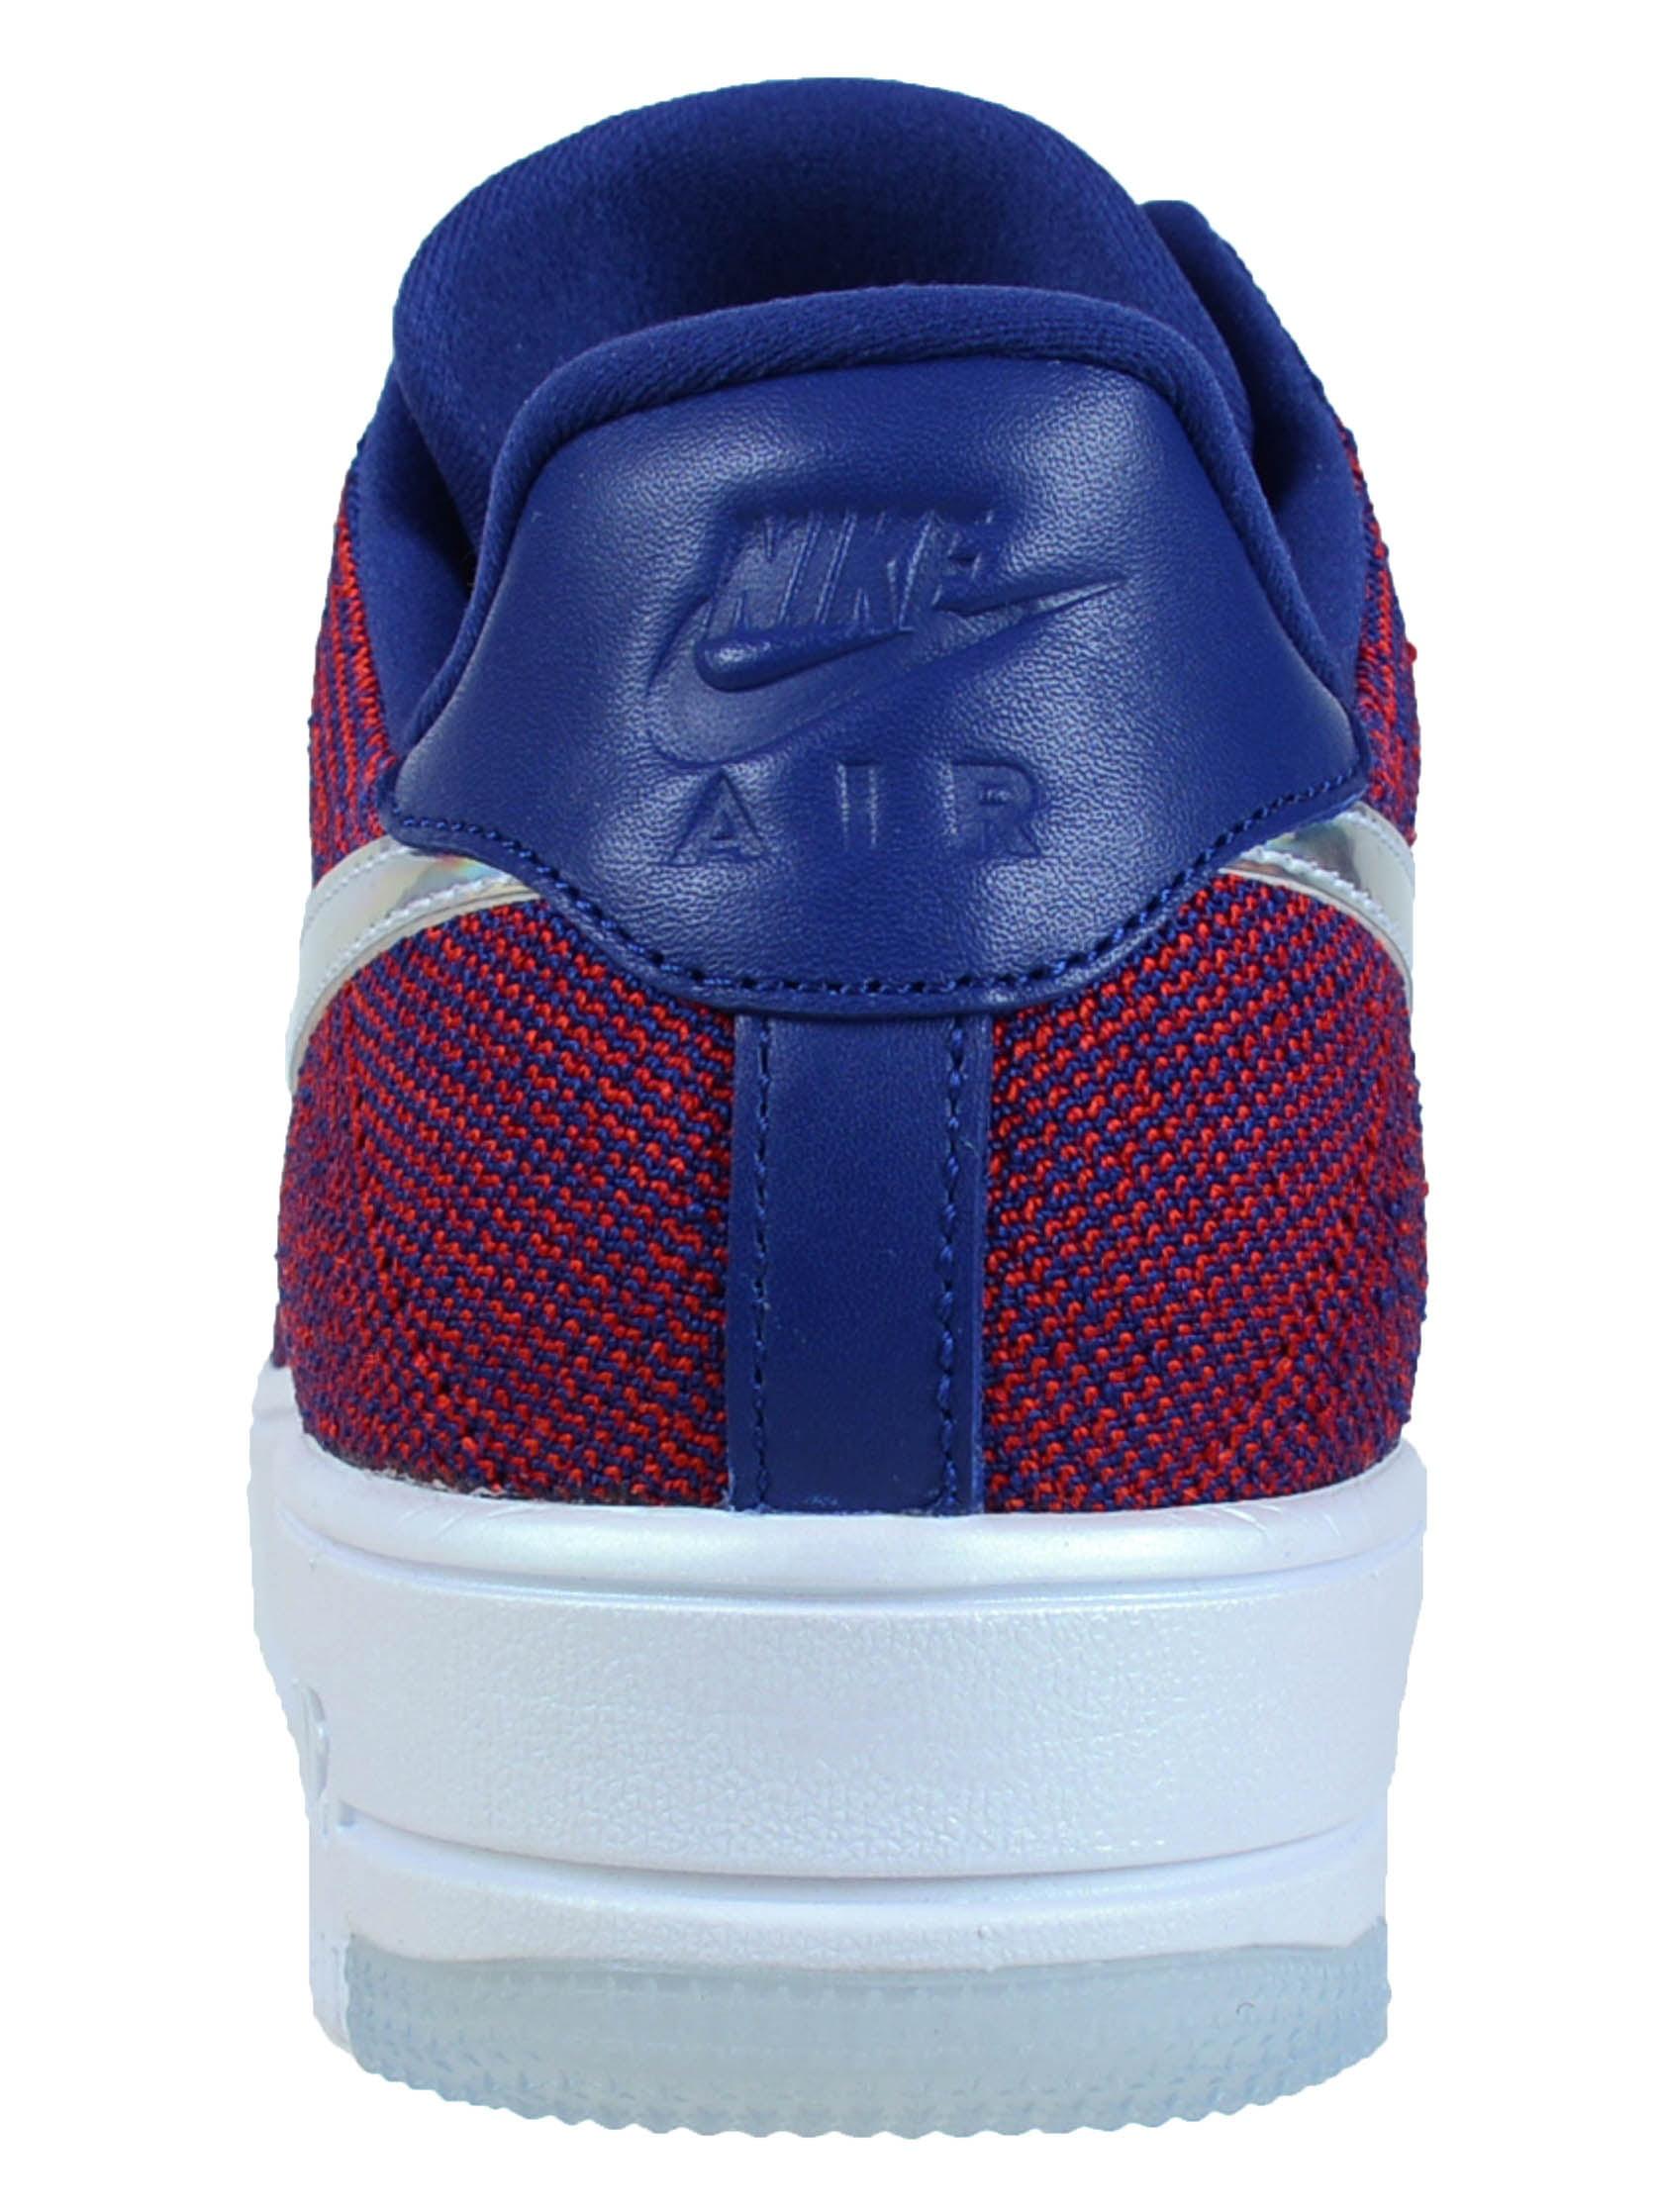 06612f9b2e36 Nike - NIKE AIR FORCE 1 ULTRA FLYKNIT LOW PRM GYM RED DEEP ROYAL BLUE WHITE 826577  601 - Walmart.com